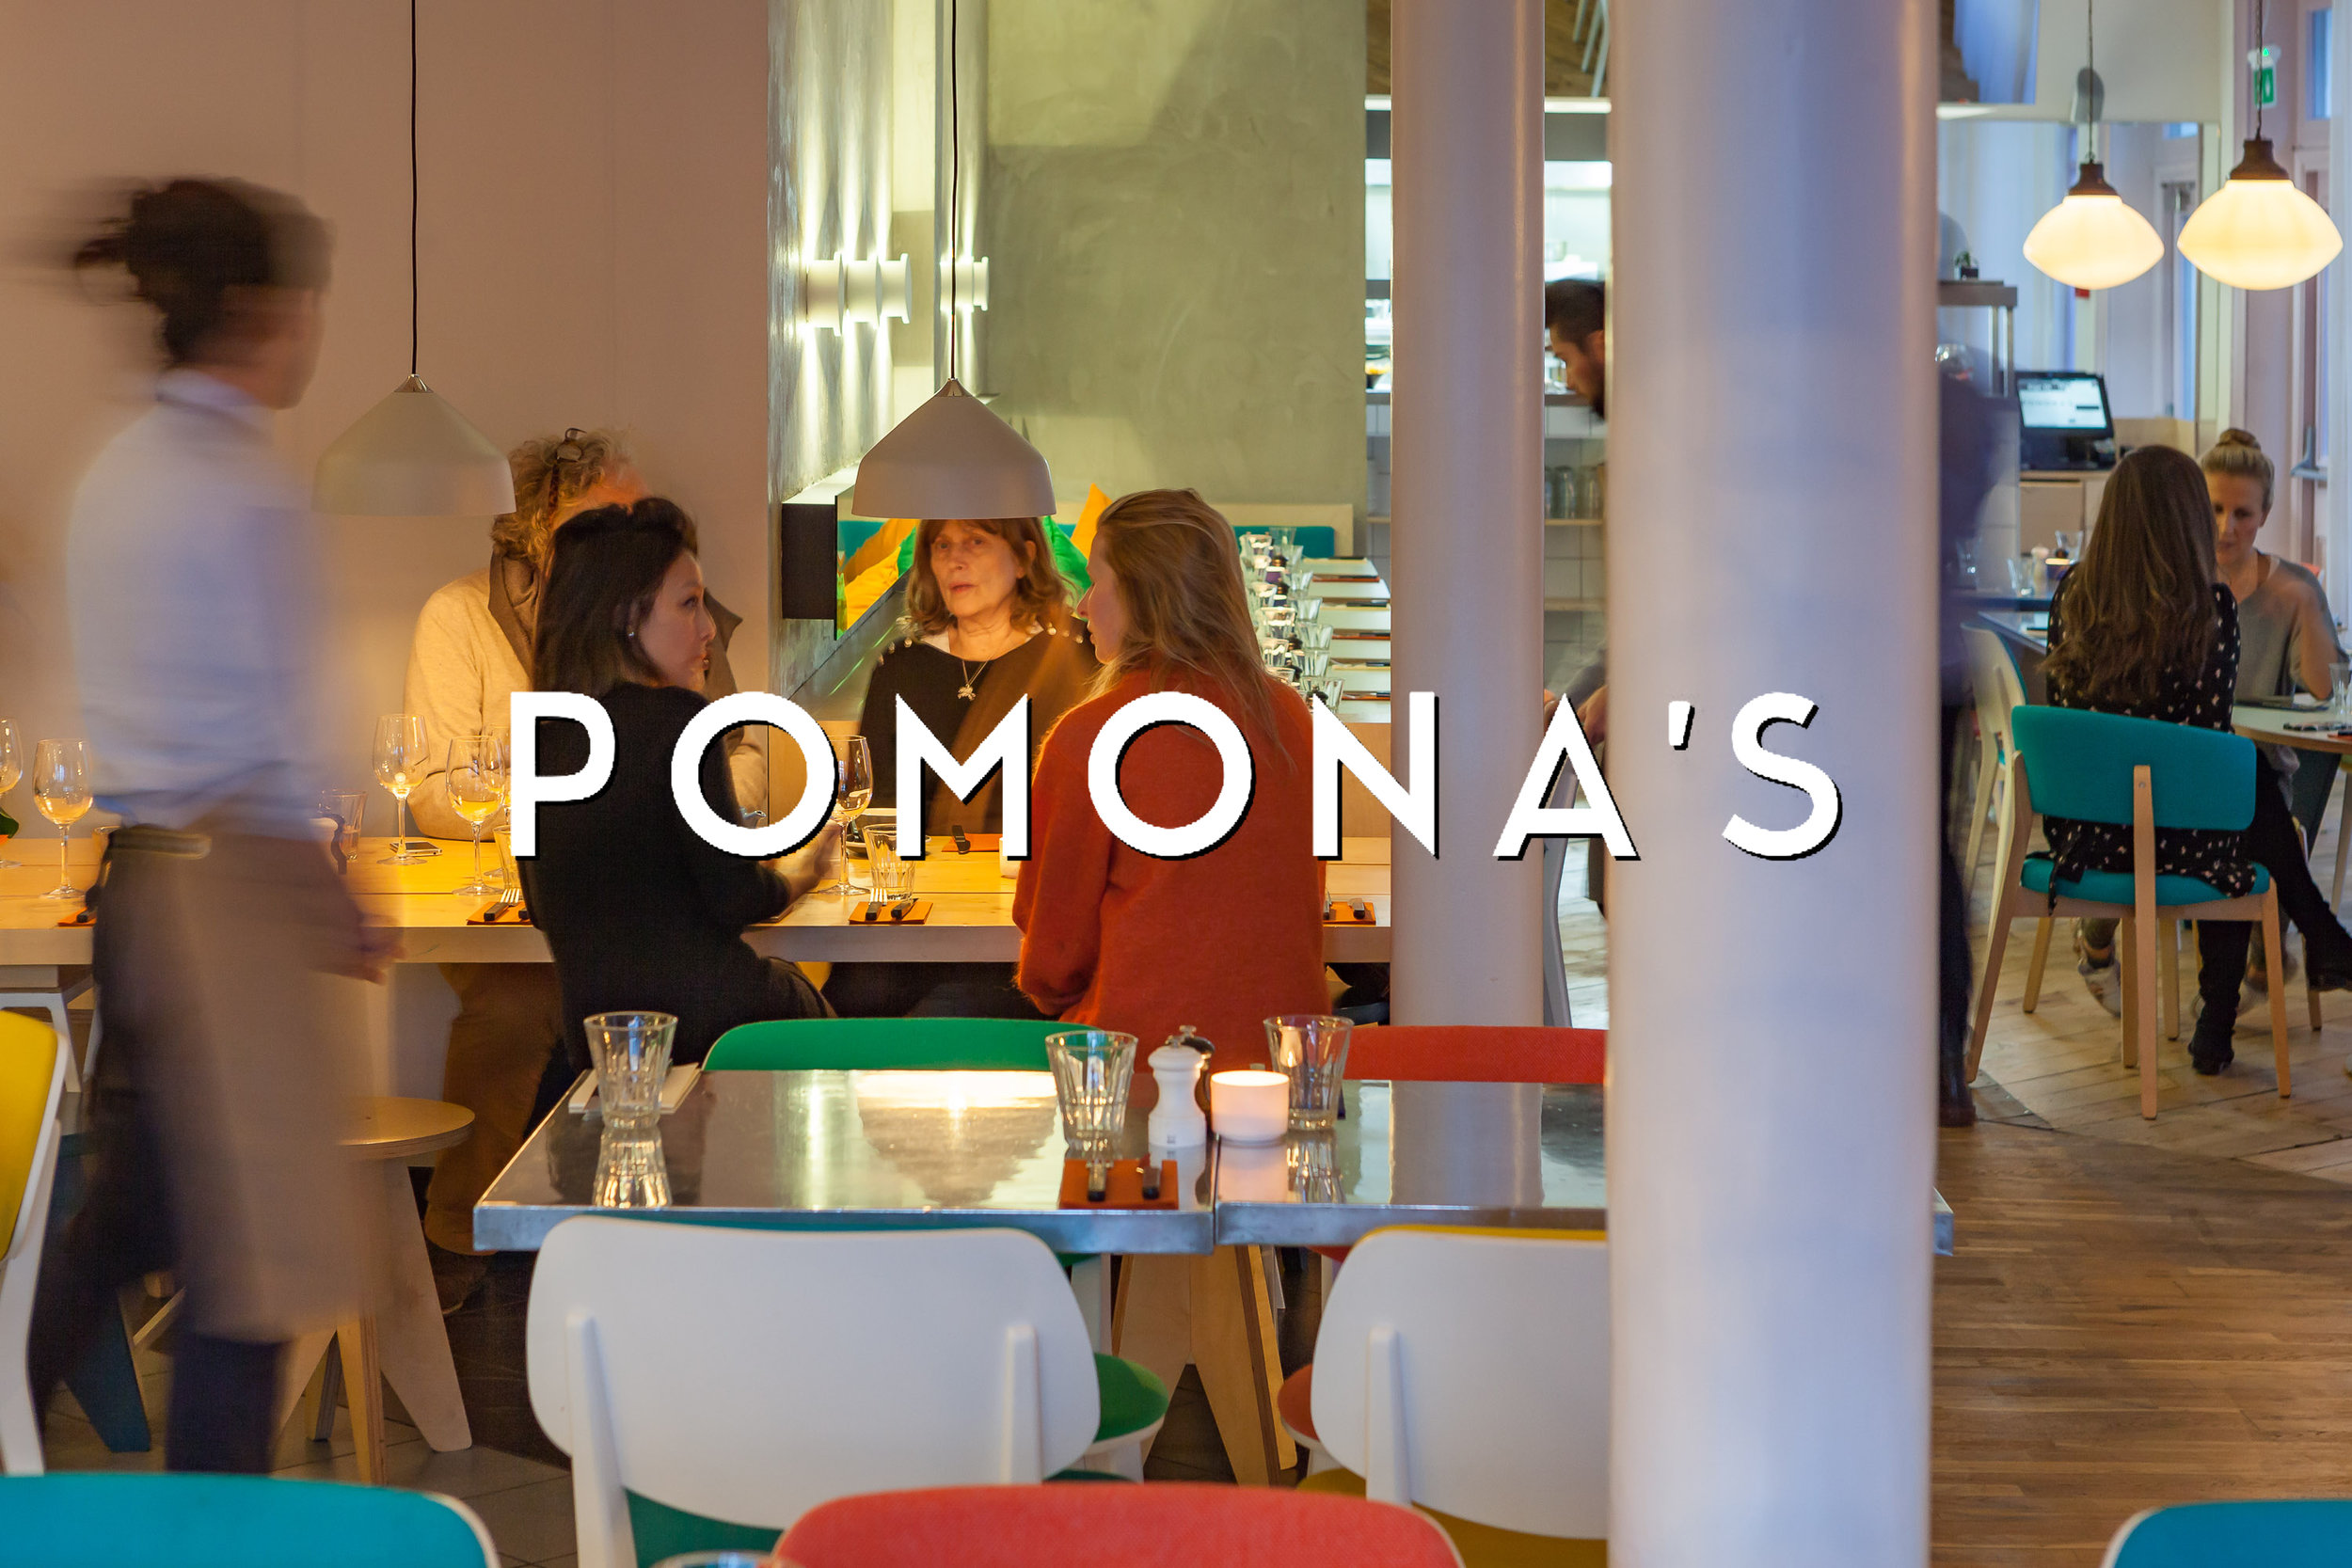 Pomonas Lifestyle Front Cover.jpg